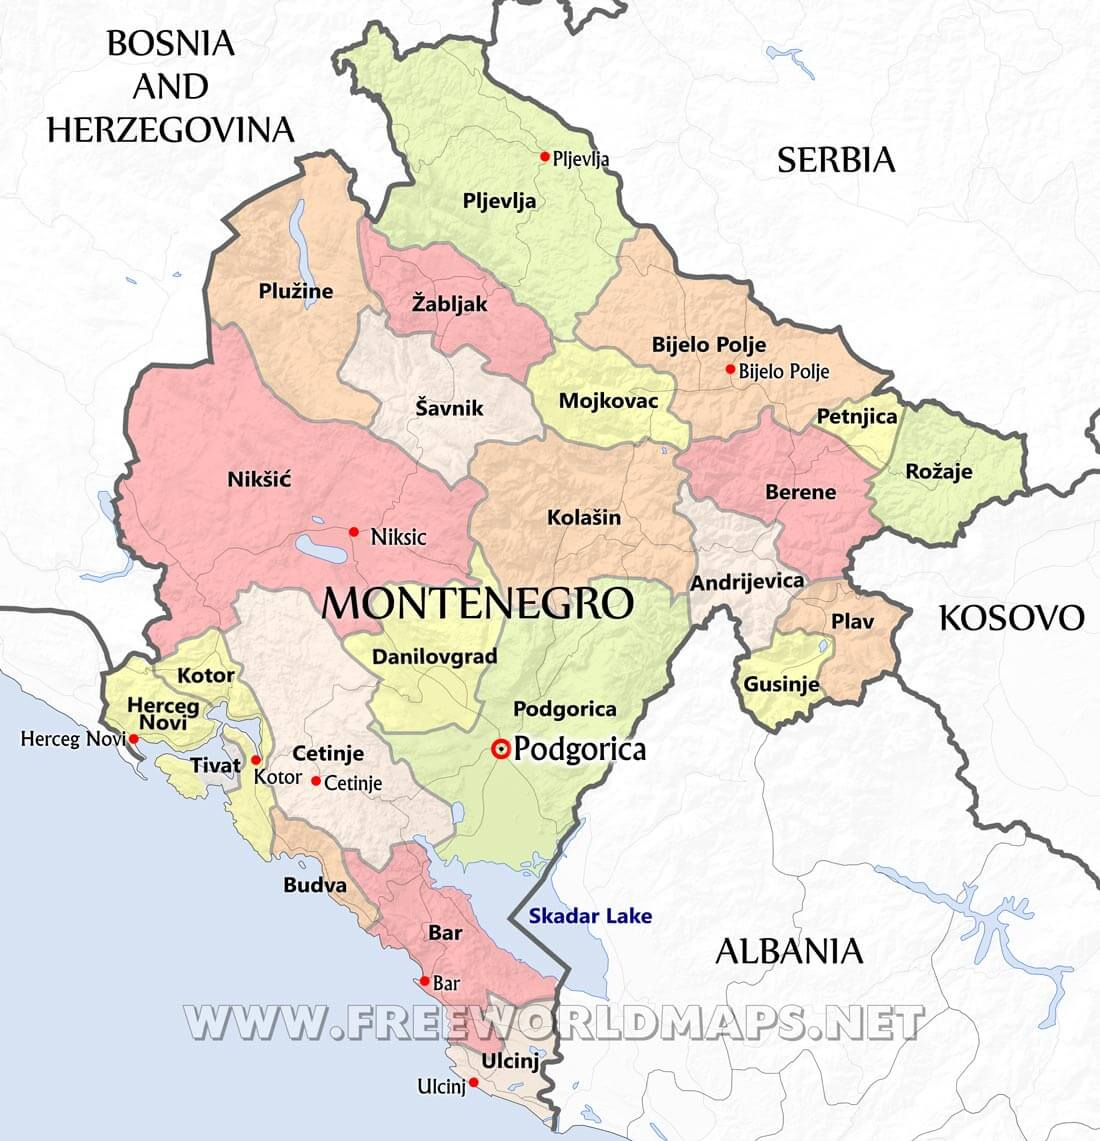 Montenegro On Europe Map.Montenegro Maps By Freeworldmaps Net